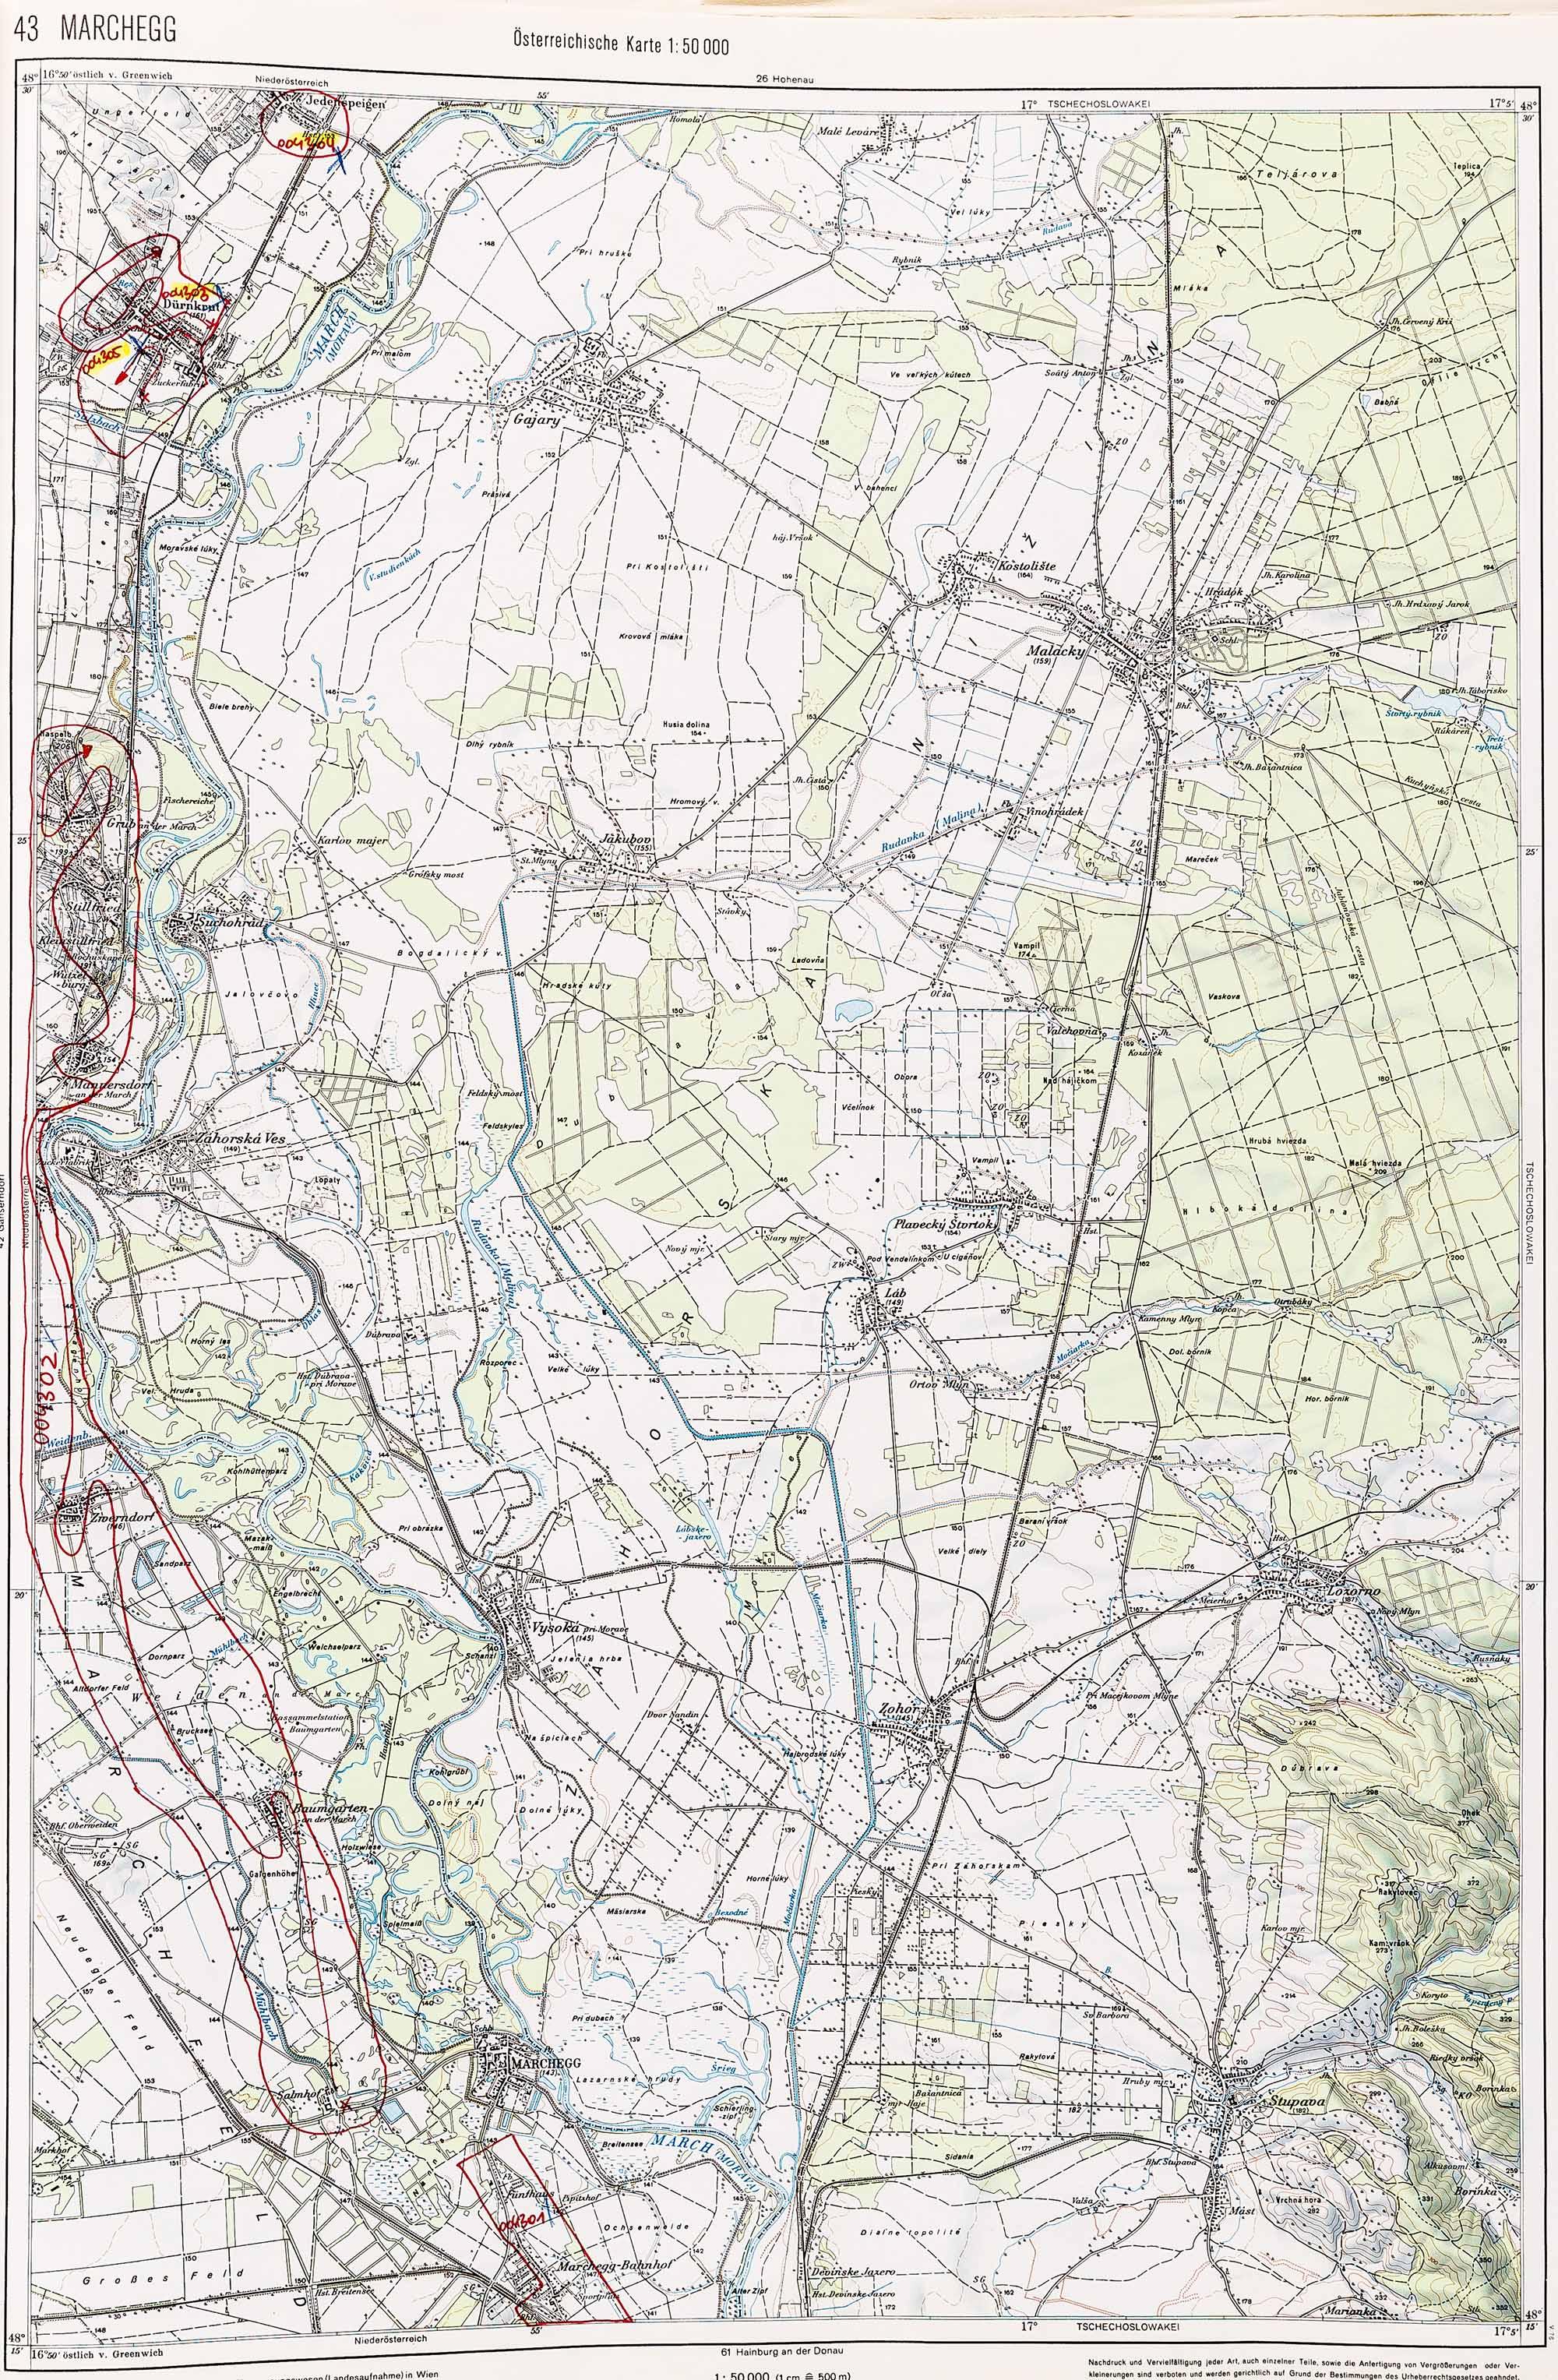 1979-1982 Karte 043